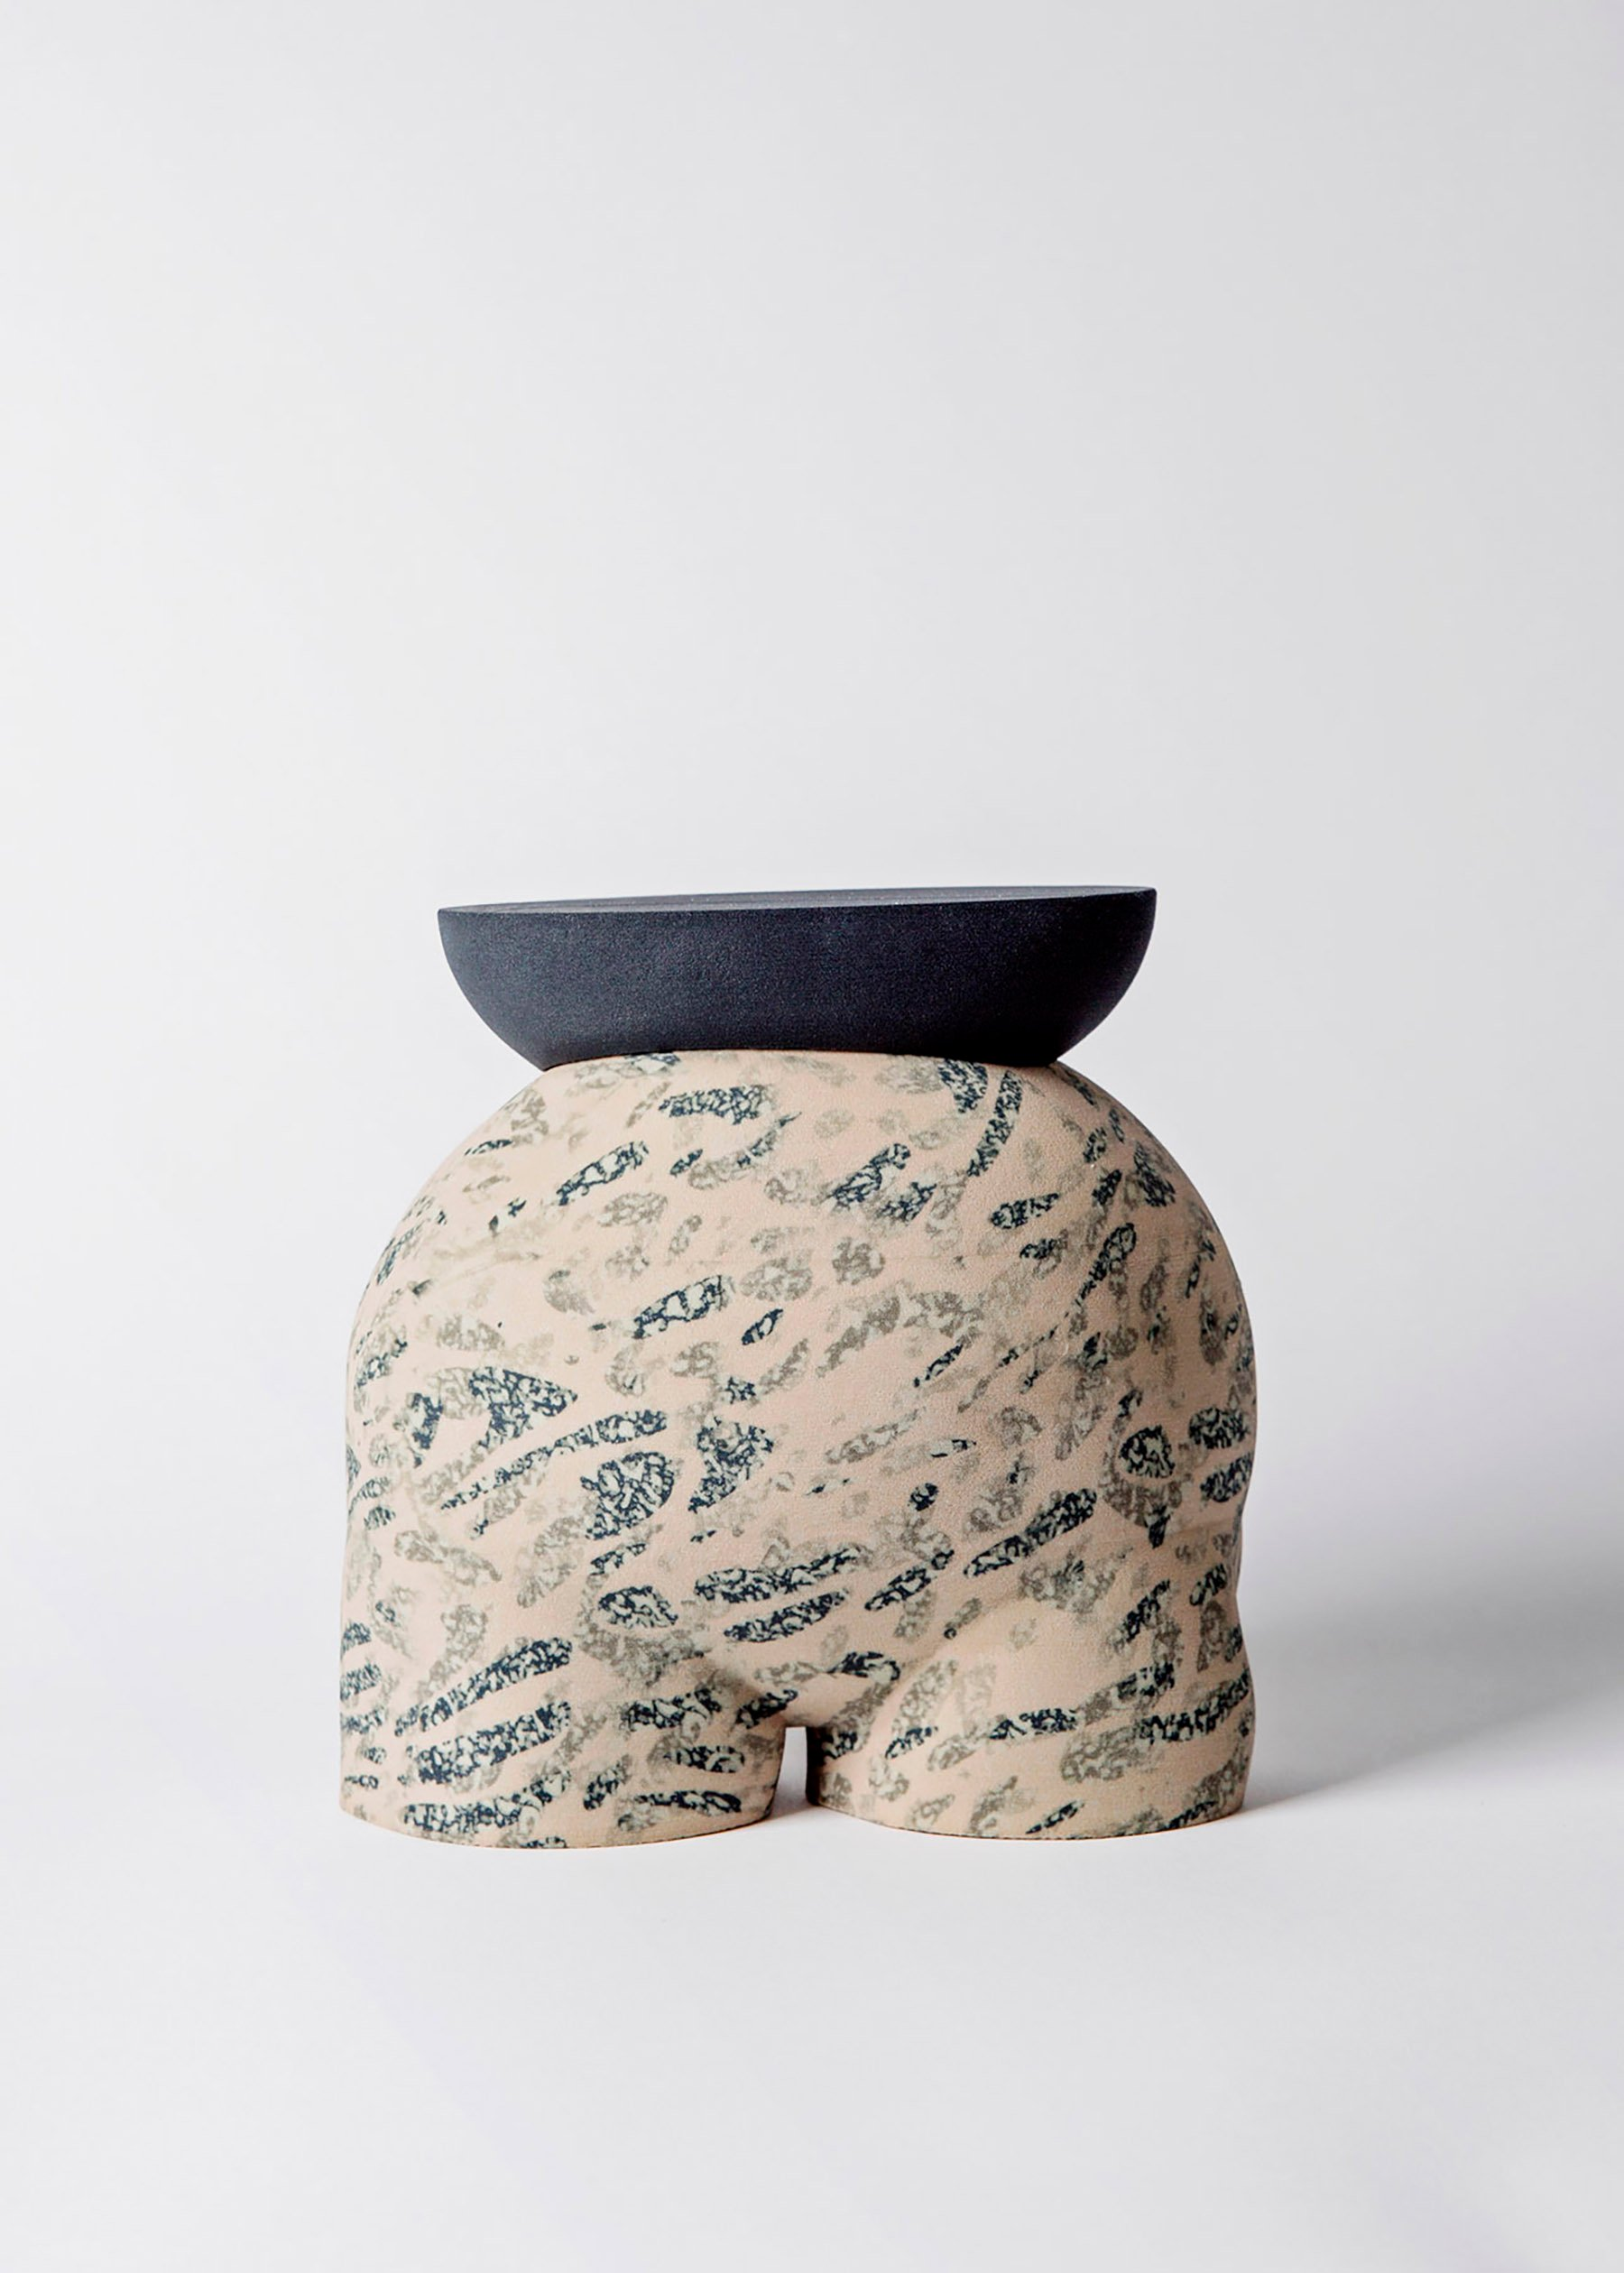 iGNANT-Design-Wang-Söderström-Table-101-010